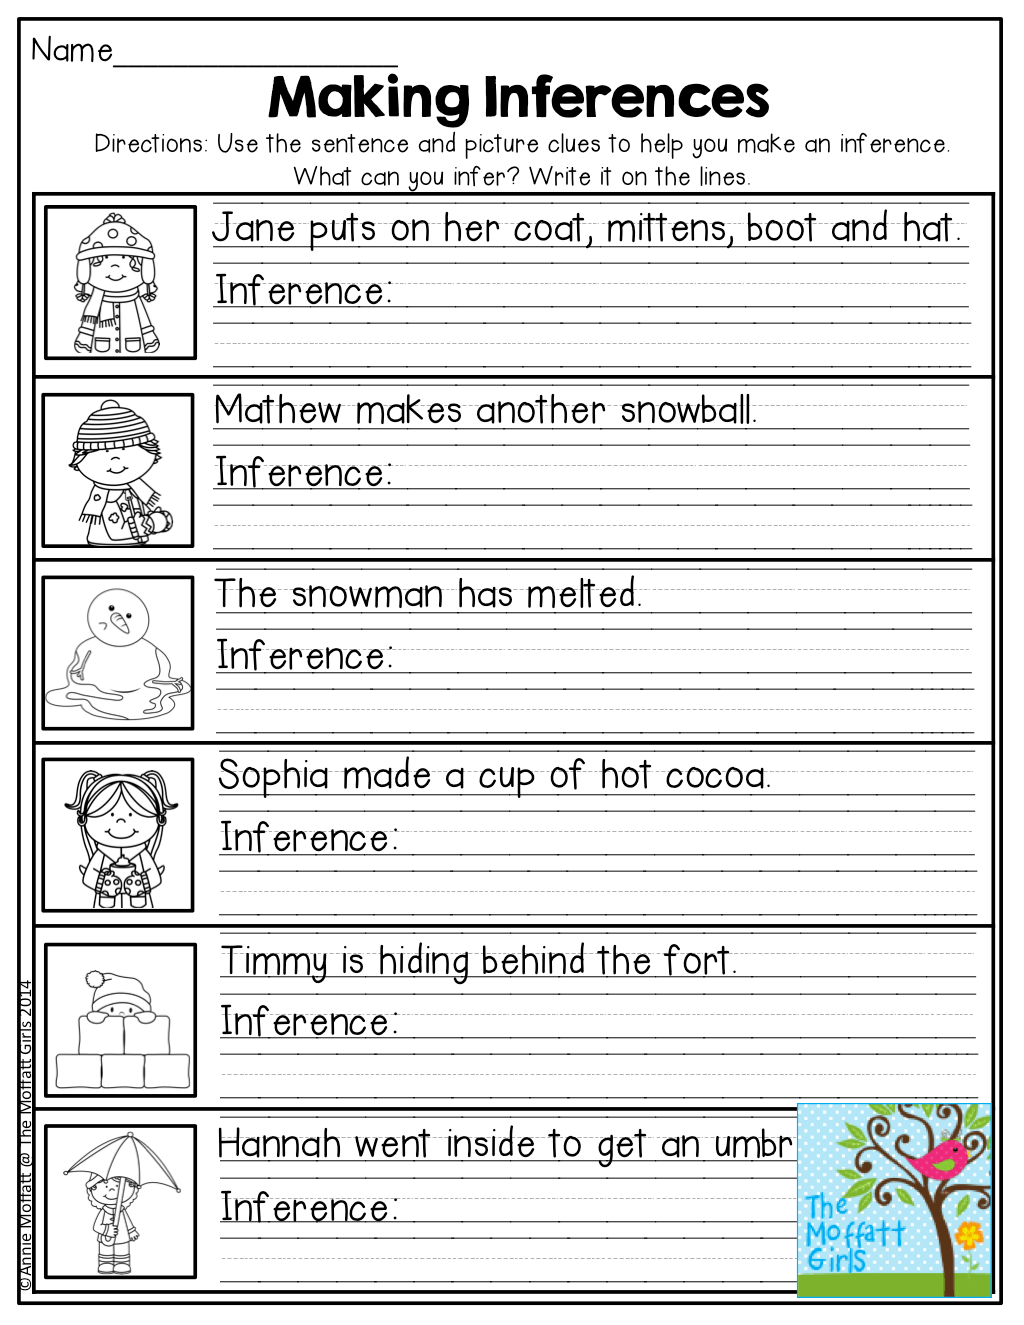 Inferencing Worksheets 2nd Grade